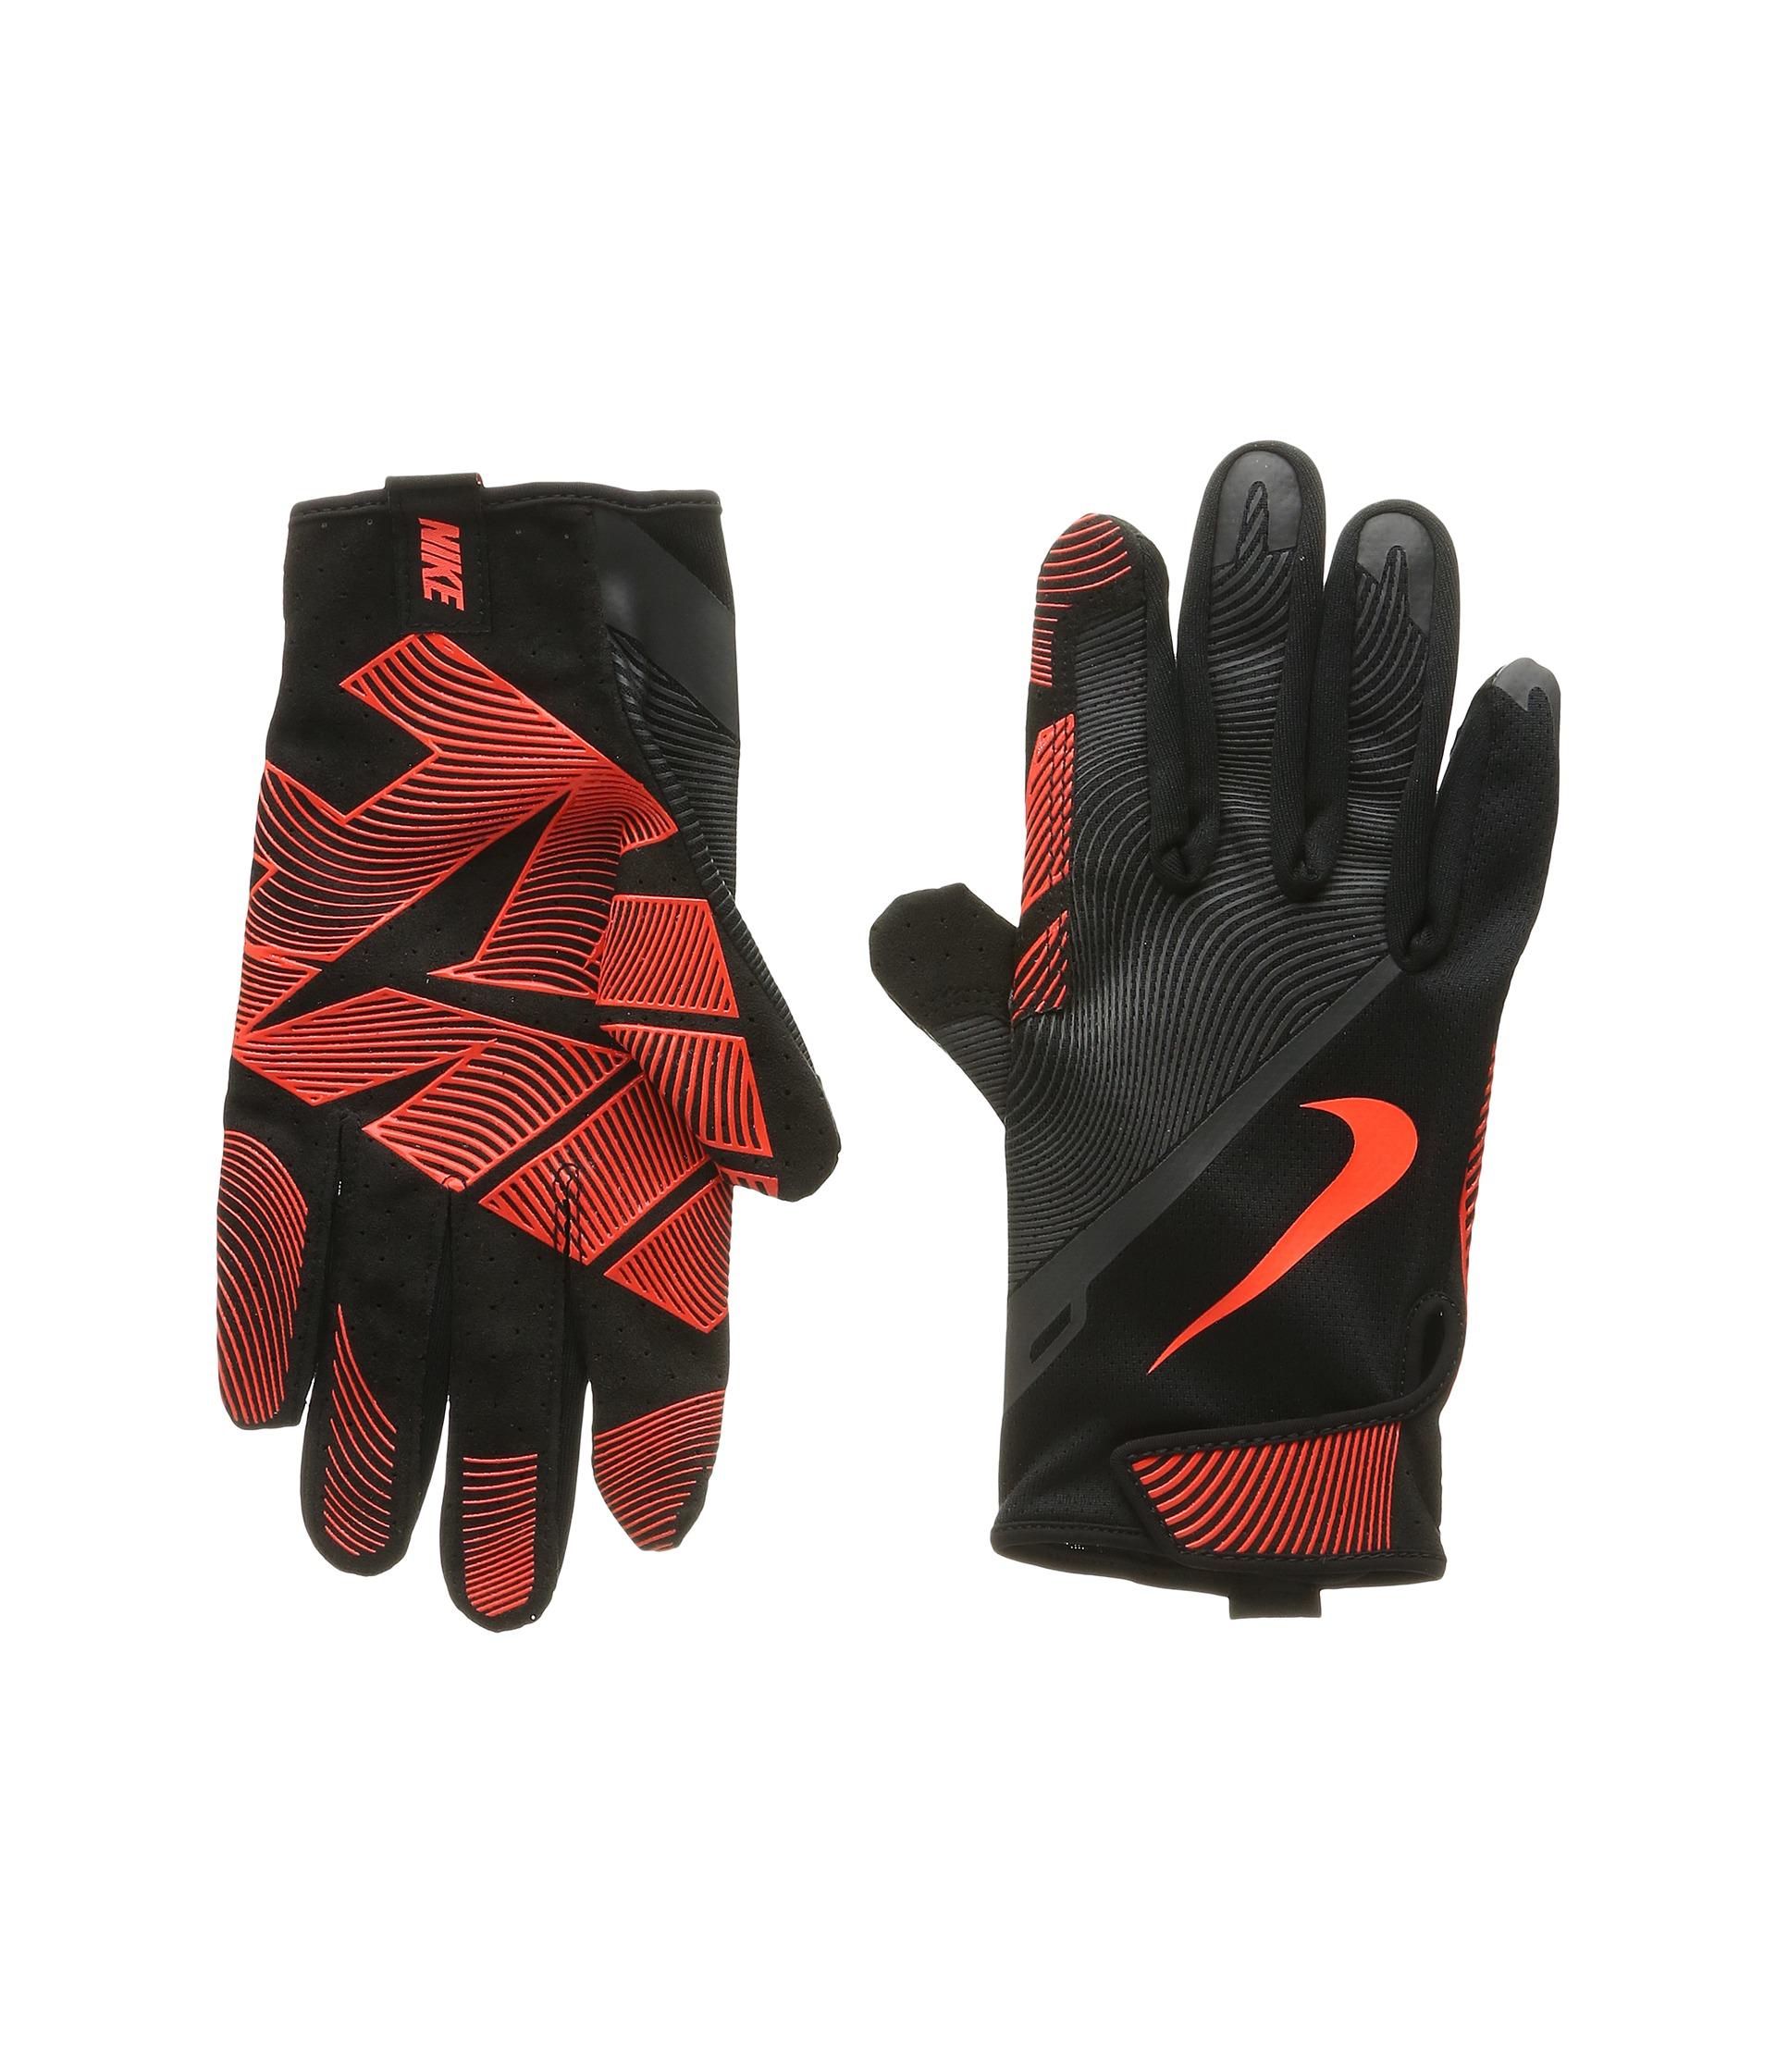 Nike Training Gloves Size Chart: Nike Lunatic Training Gloves Black/Anthracite/Total